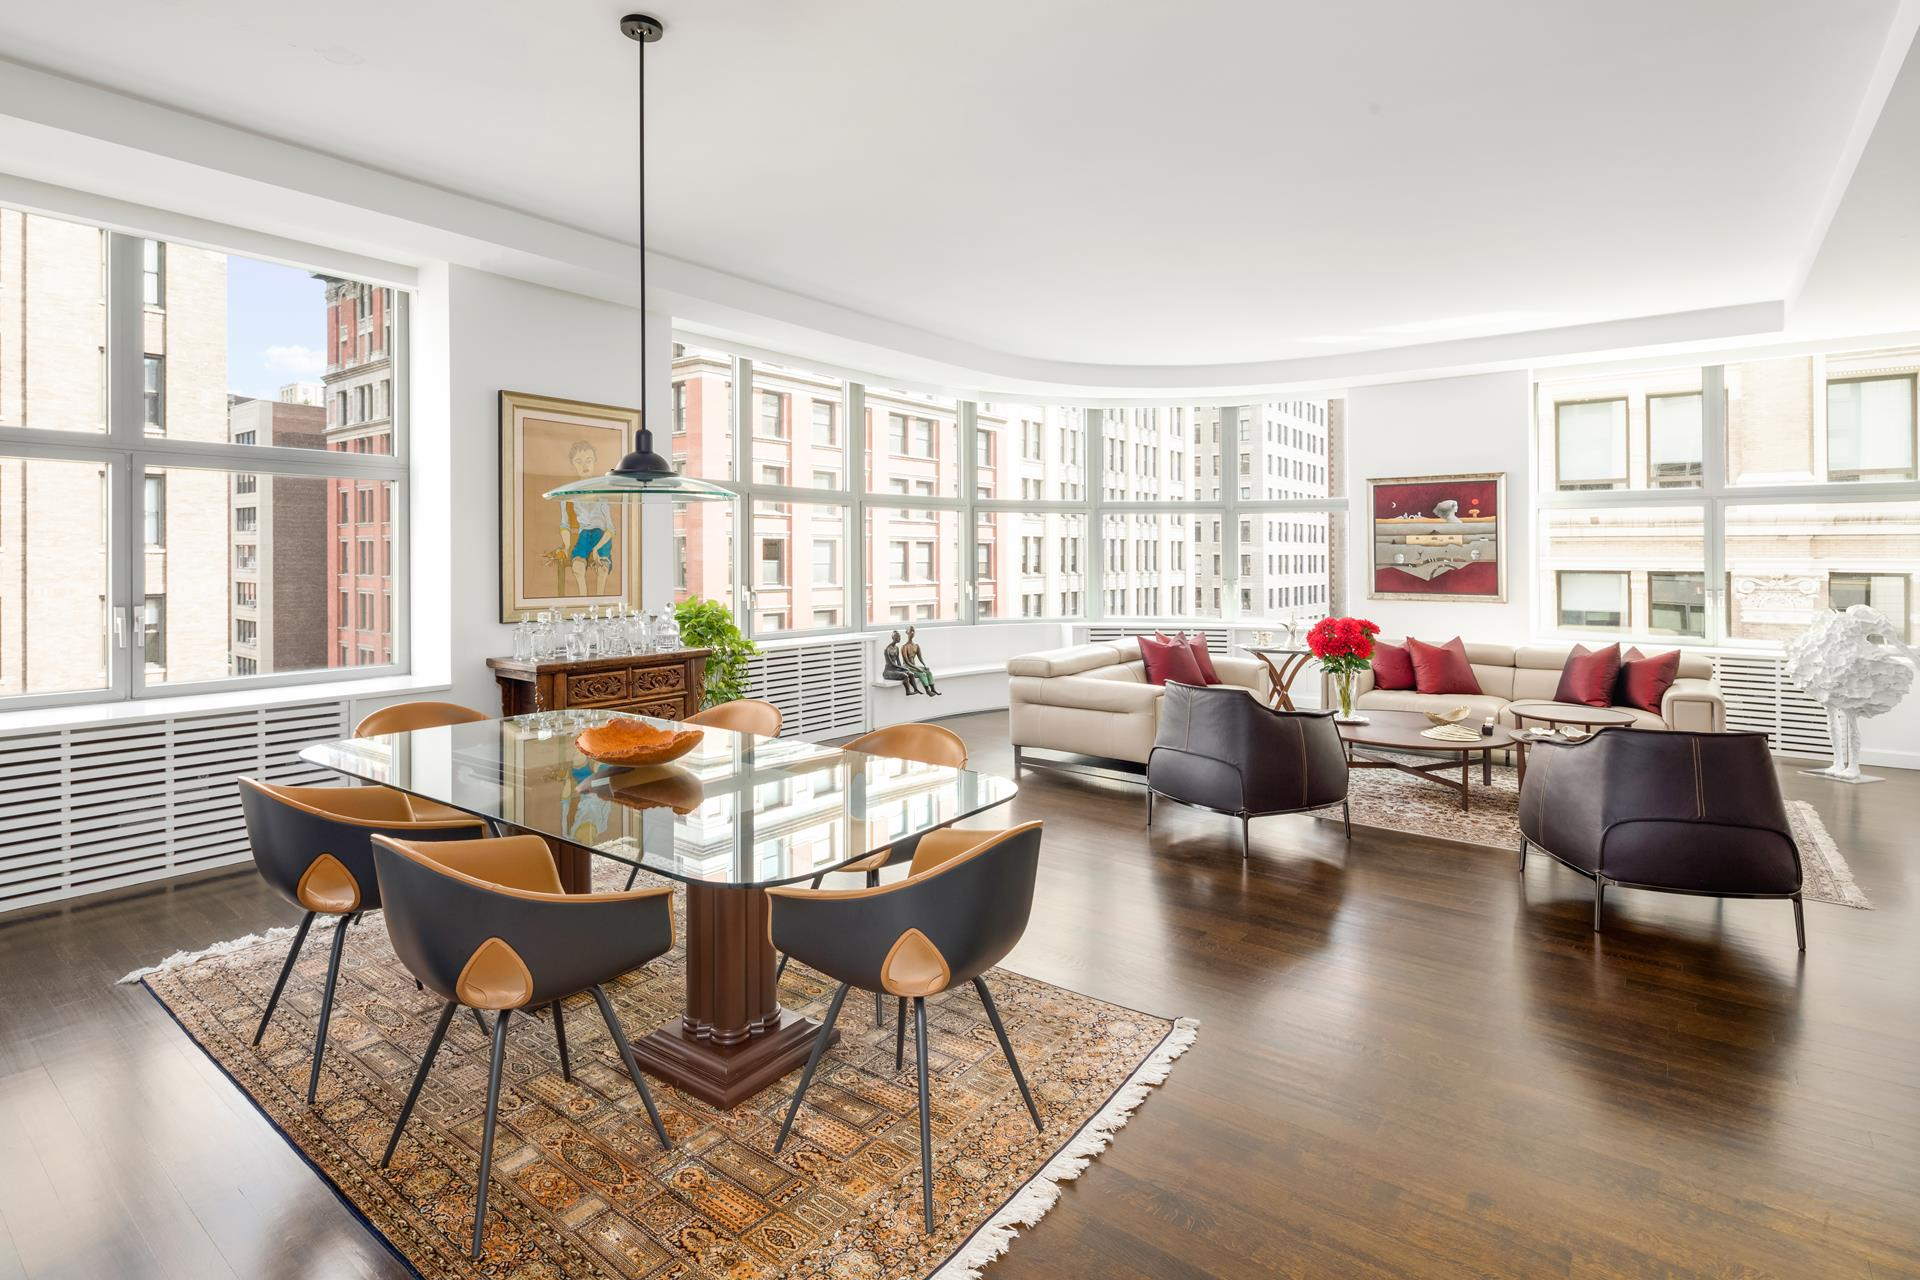 Condominium for Sale at 240 Park Avenue South 9-A 240 Park Avenue South New York, New York 10003 United States